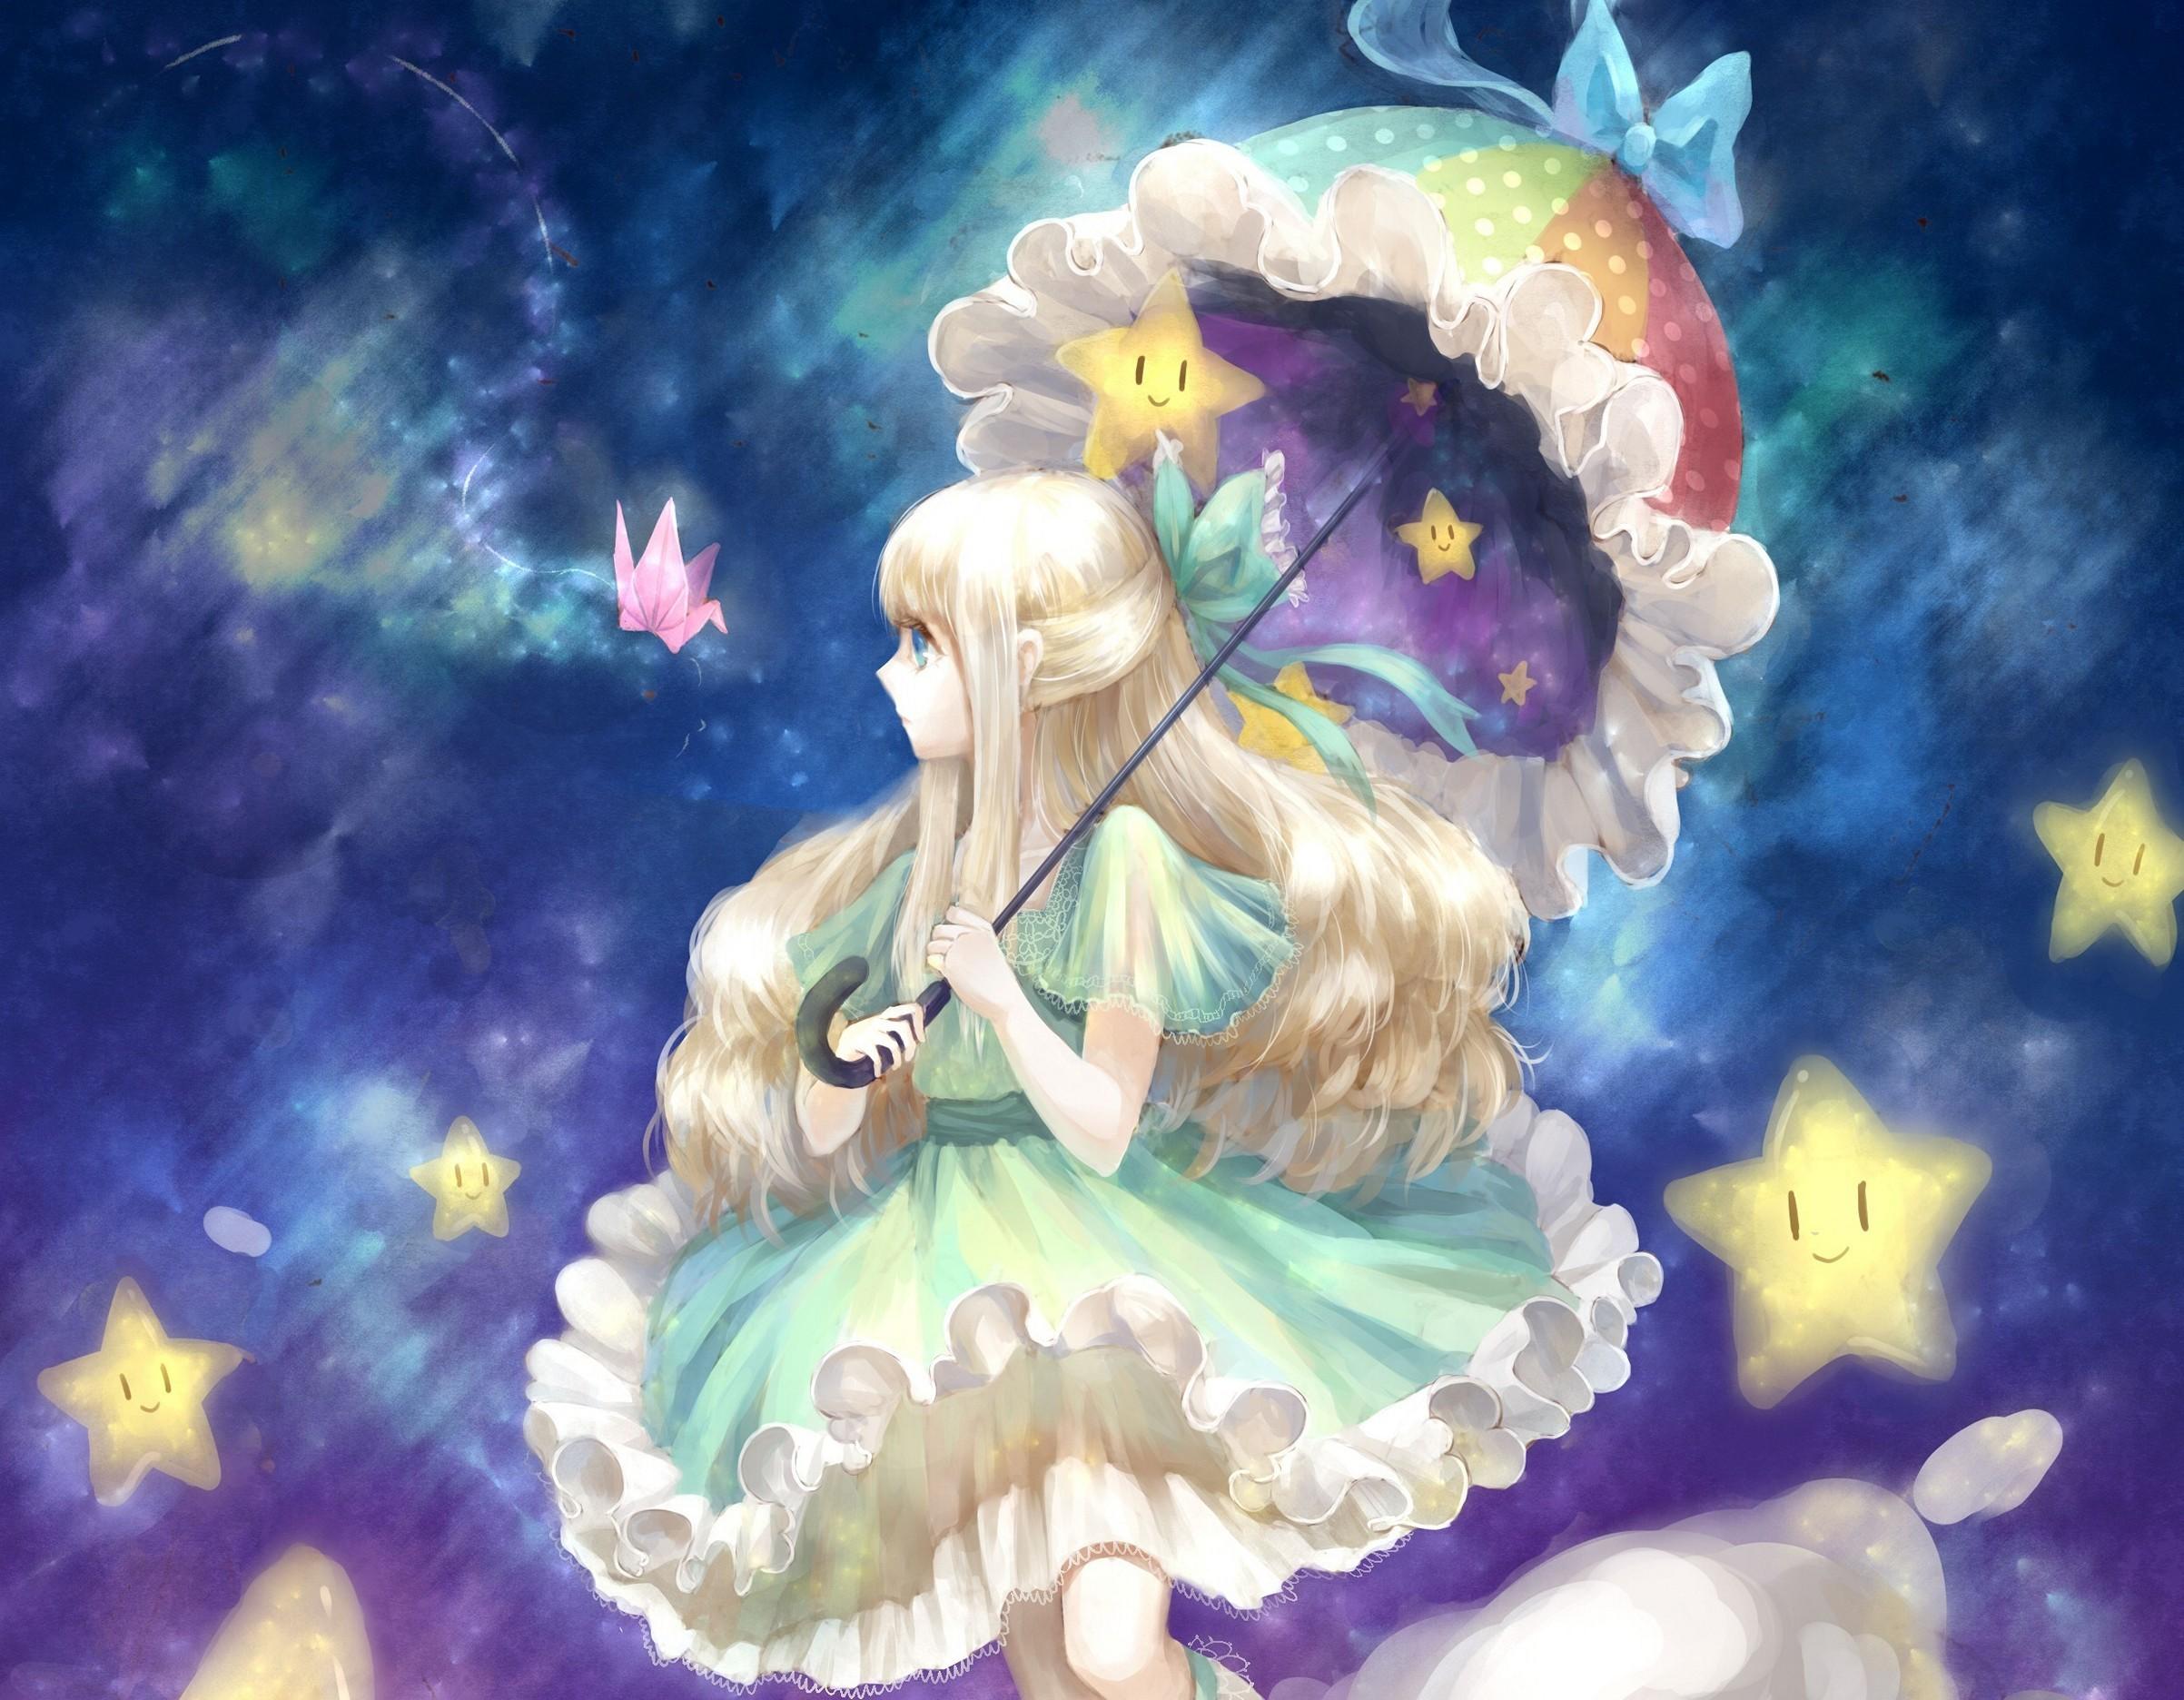 Wallpaperswide anime wallpaper